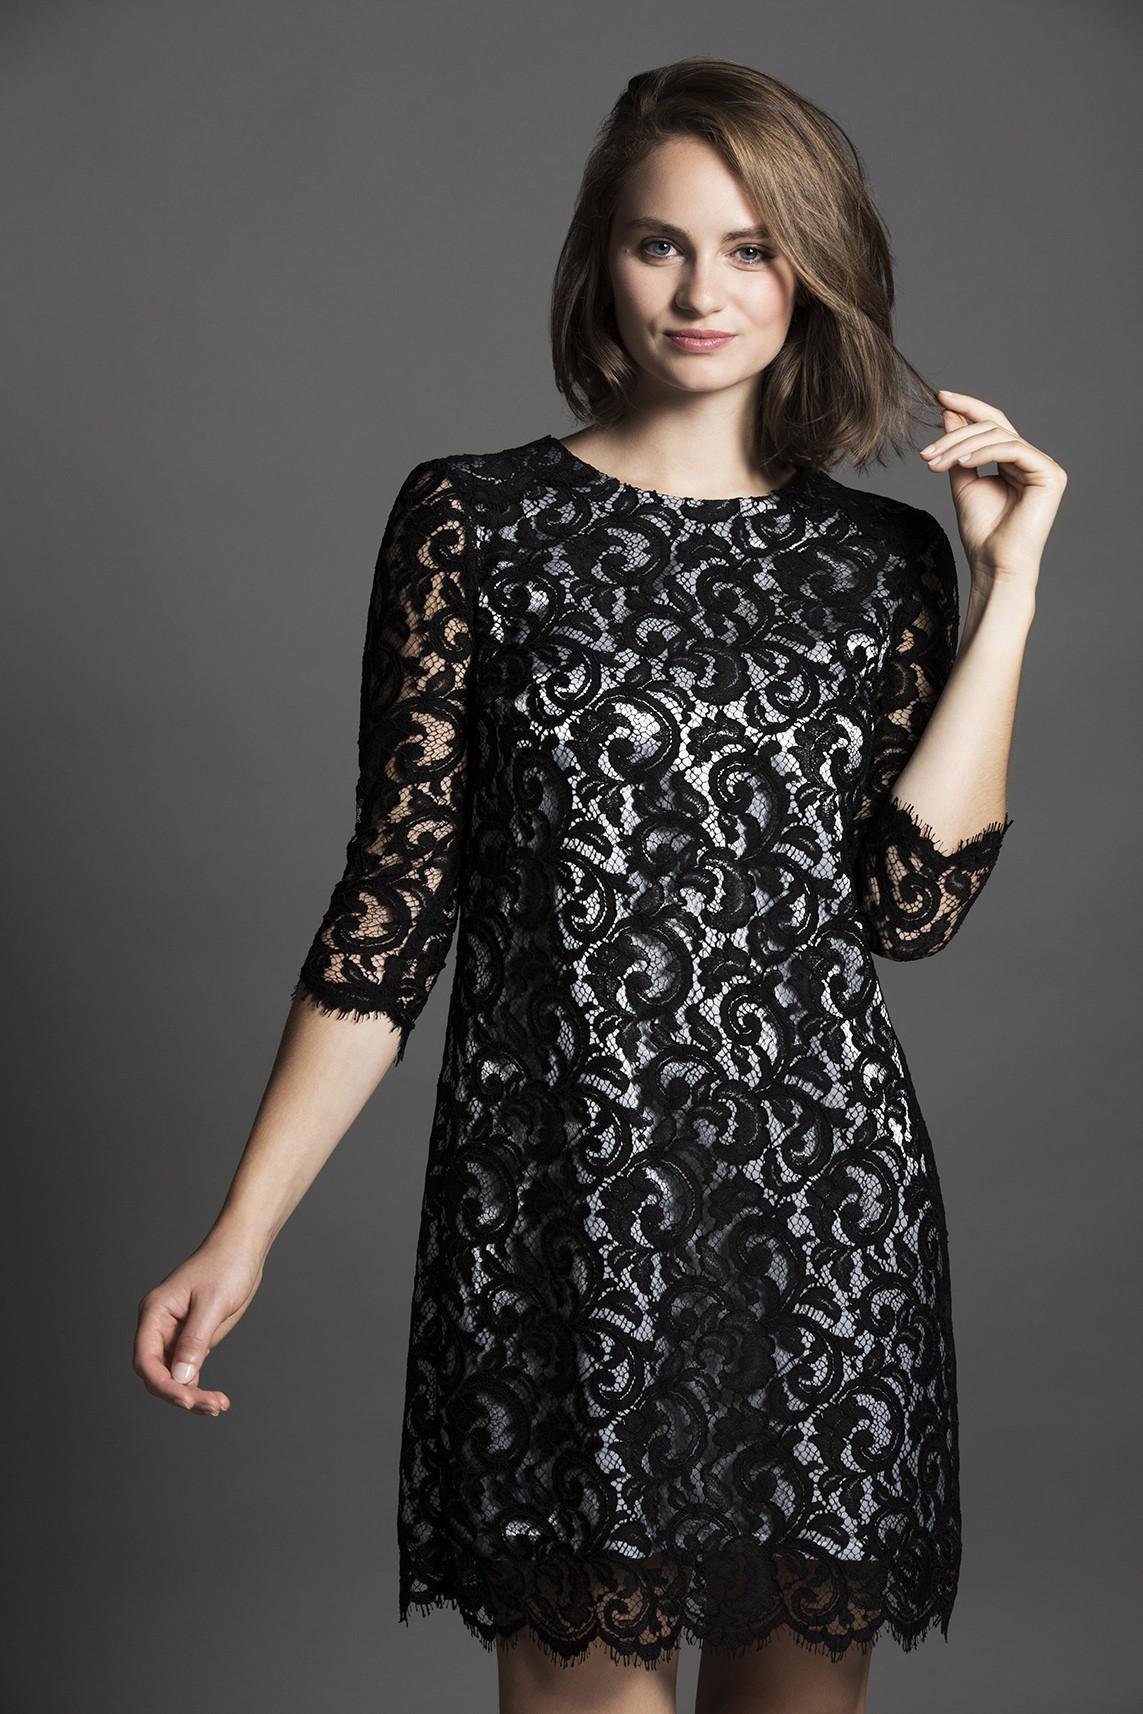 Robe en dentelle de calais prix les tendances de la mode for Prix de la robe de lazaro